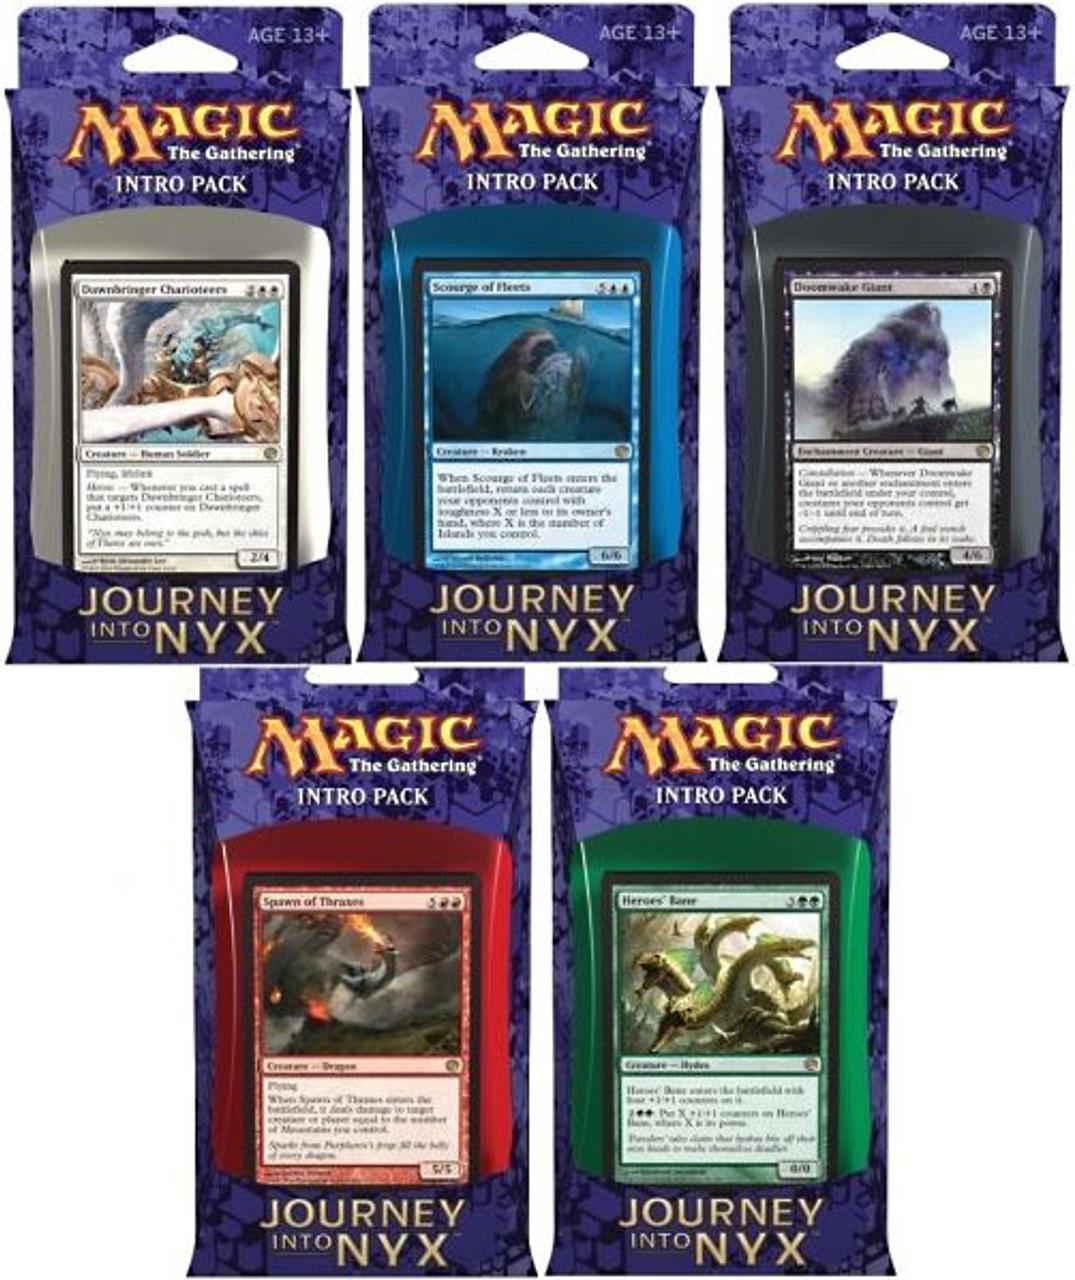 MtG Set of 5 Journey into Nyx Intro Packs